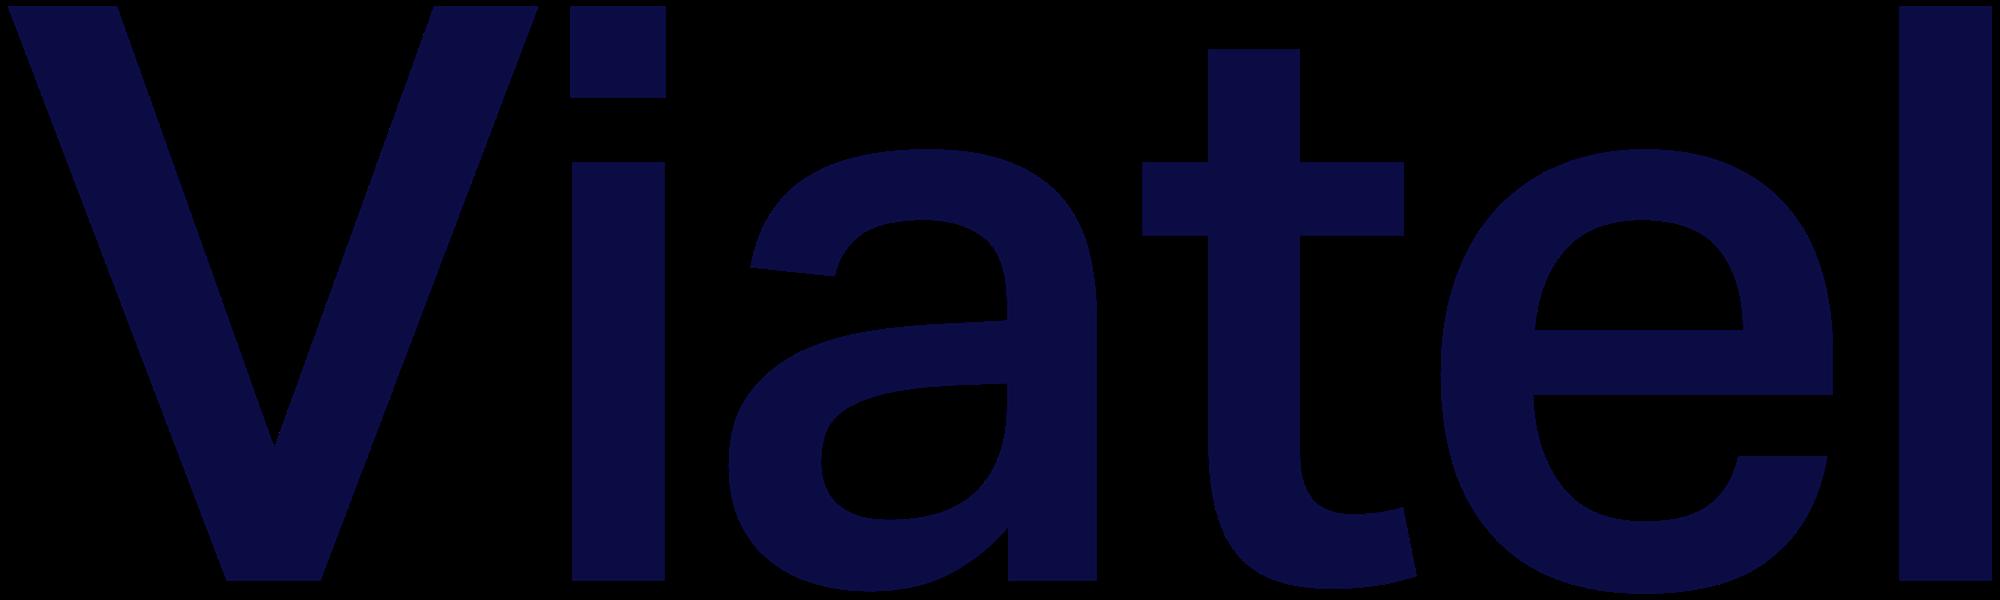 Viatel Ireland Limited